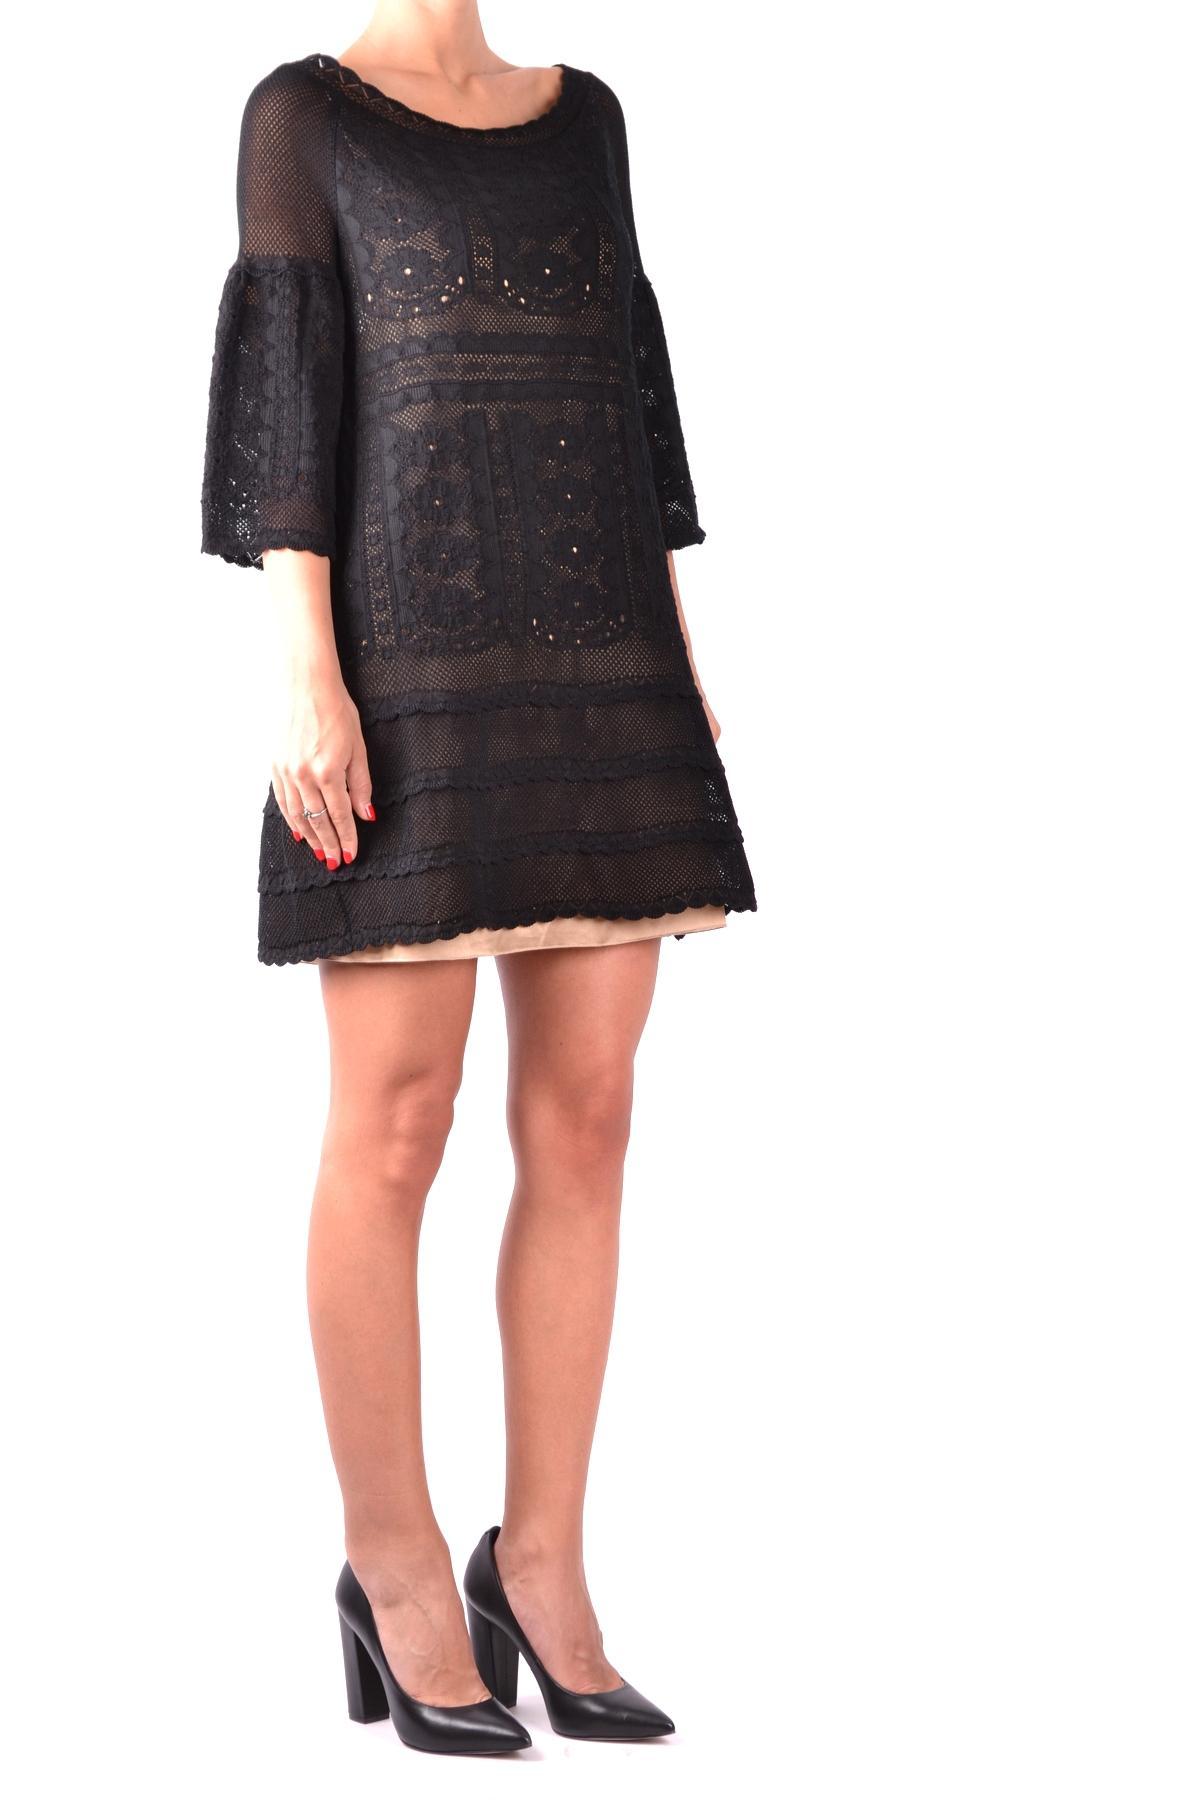 best value e56e6 64fdb Women's Black Cotton Dress